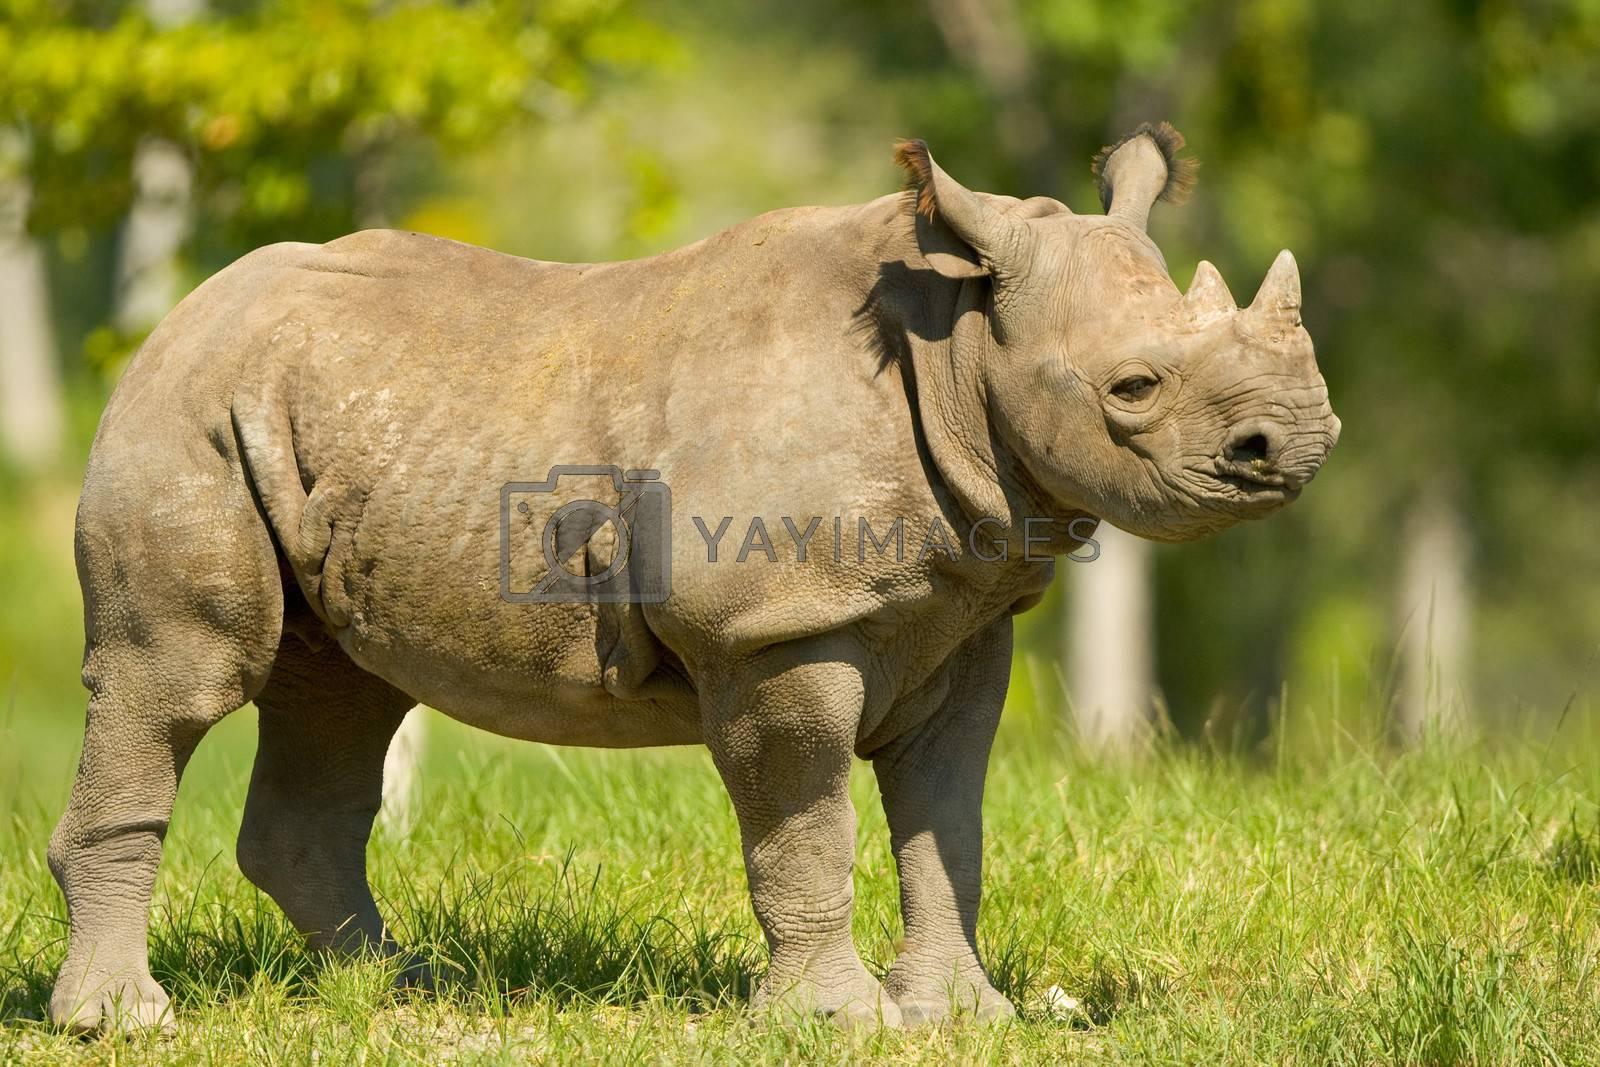 Rhinoceros standing on grass